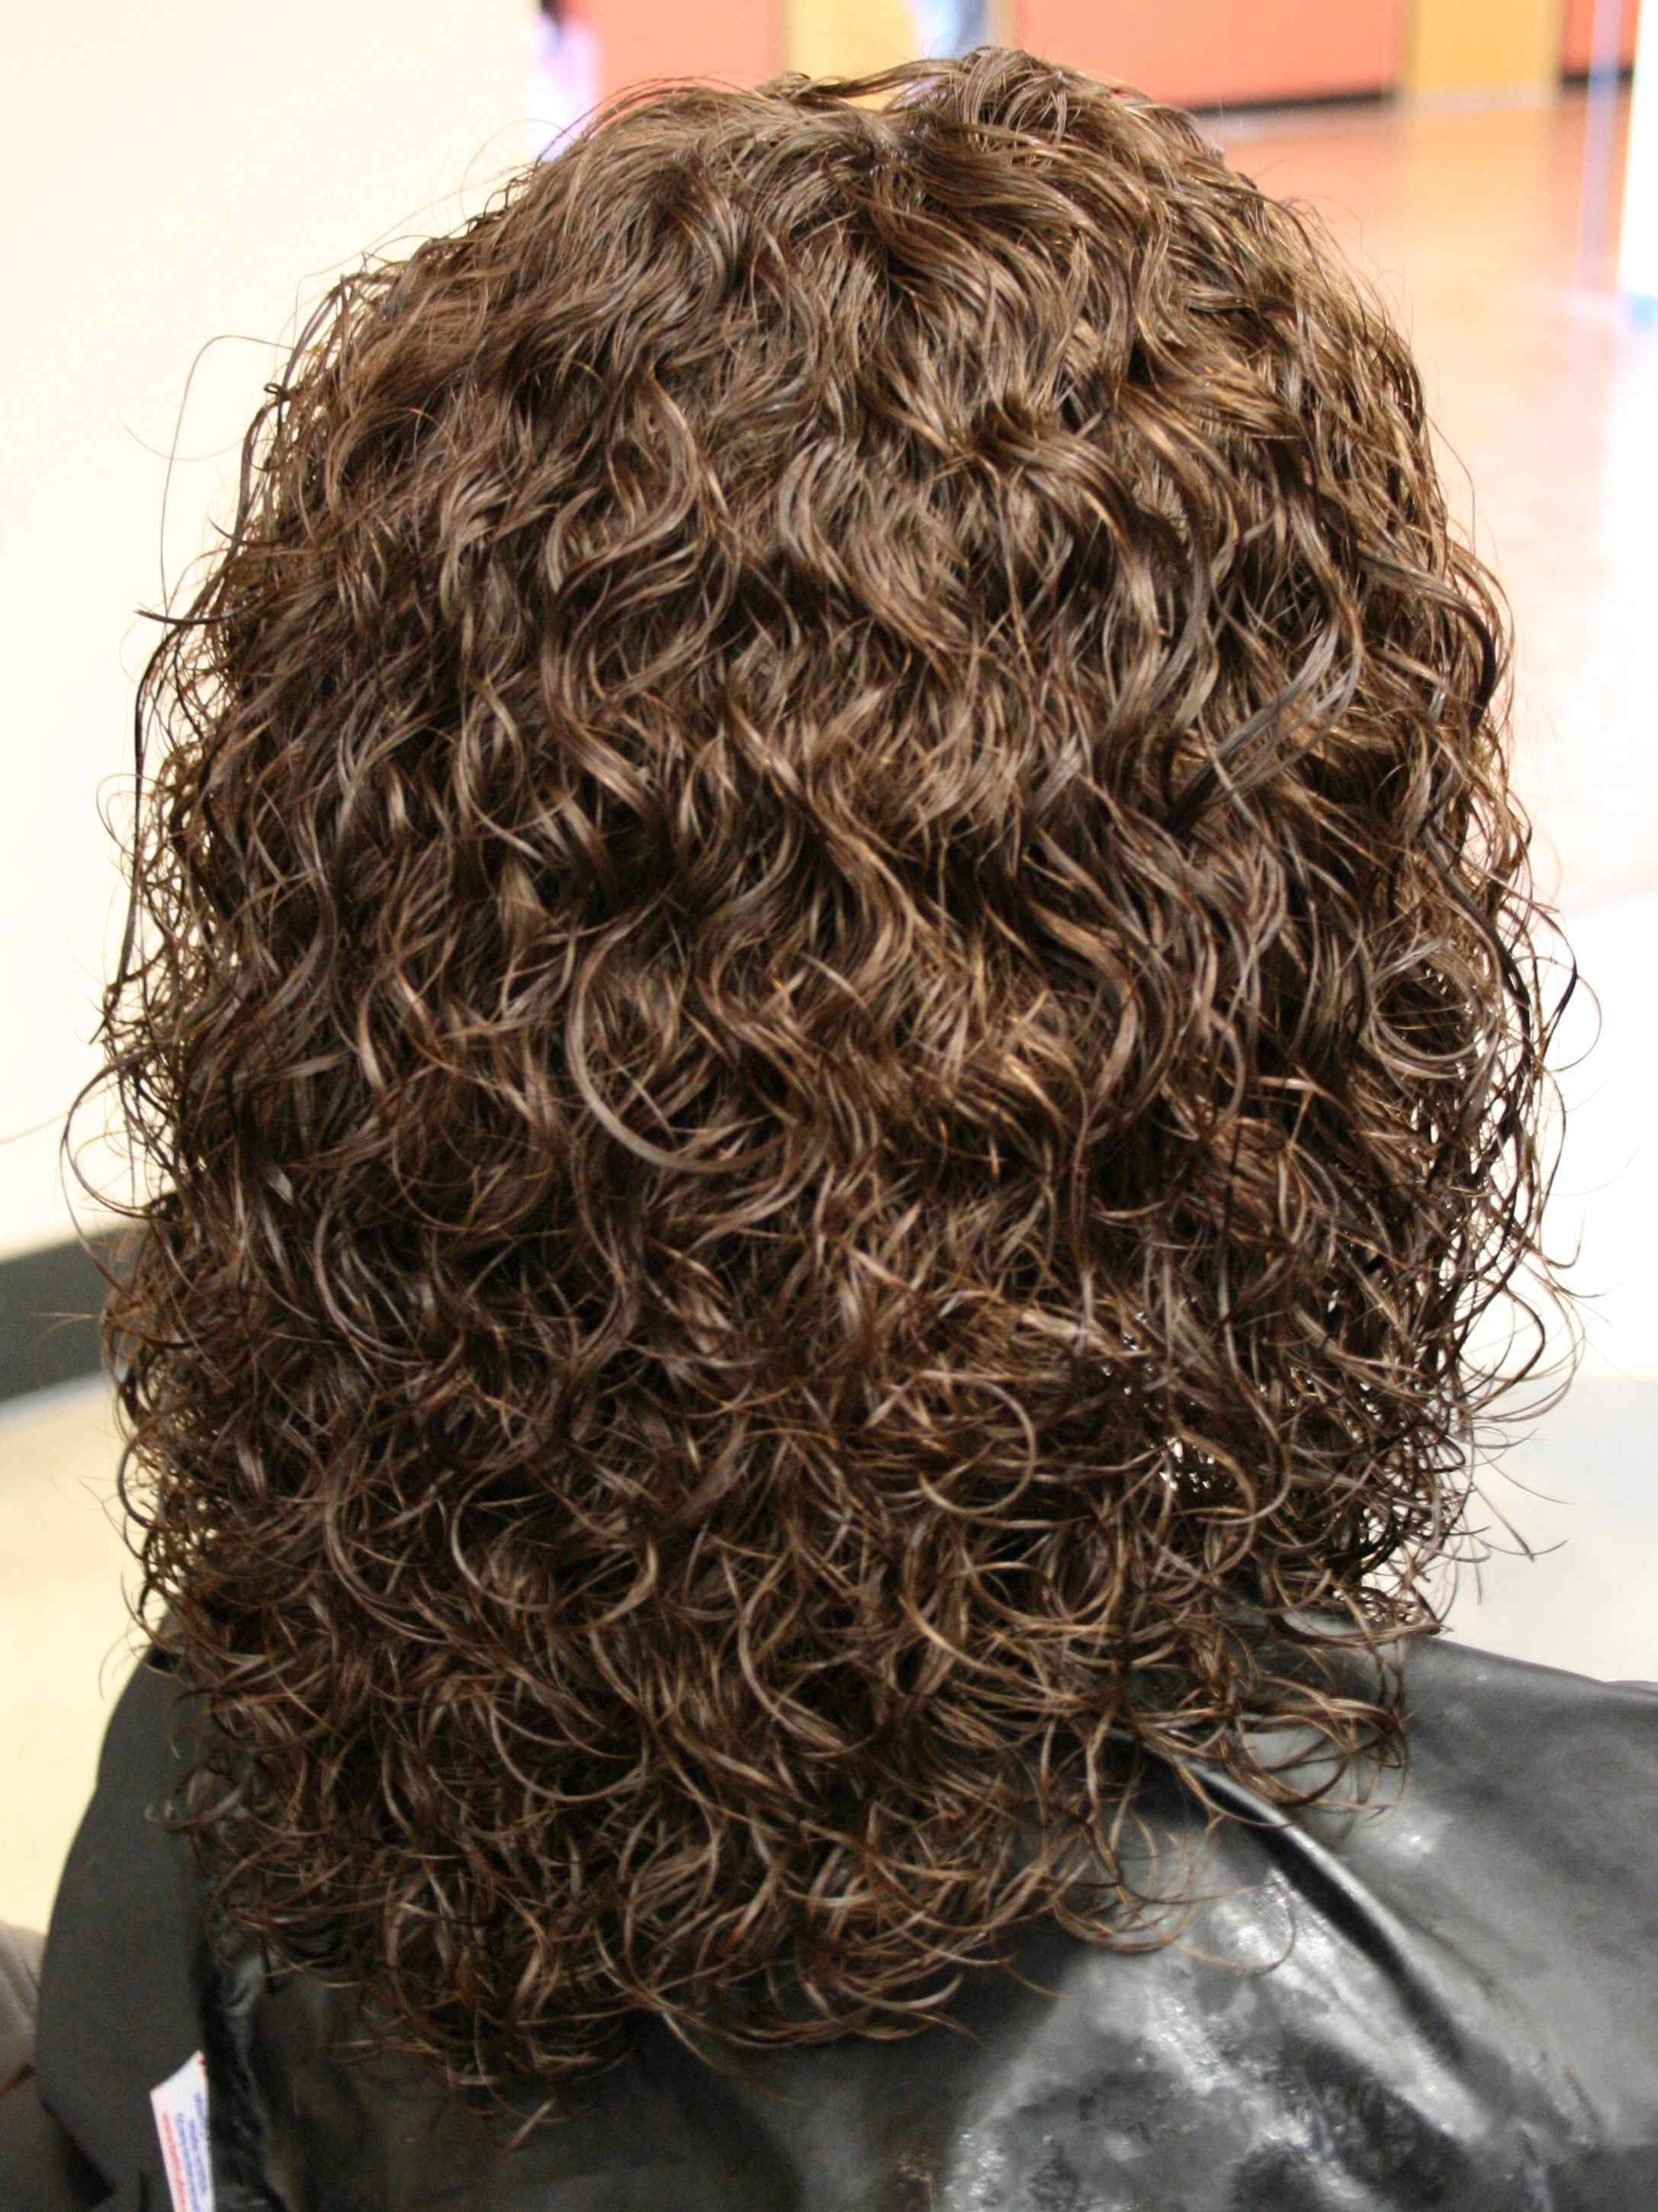 Hair Perm How To Perm Hair Perms For Long Hair Short Medium Length Hair Styles Permed Hairstyles Short Permed Hair